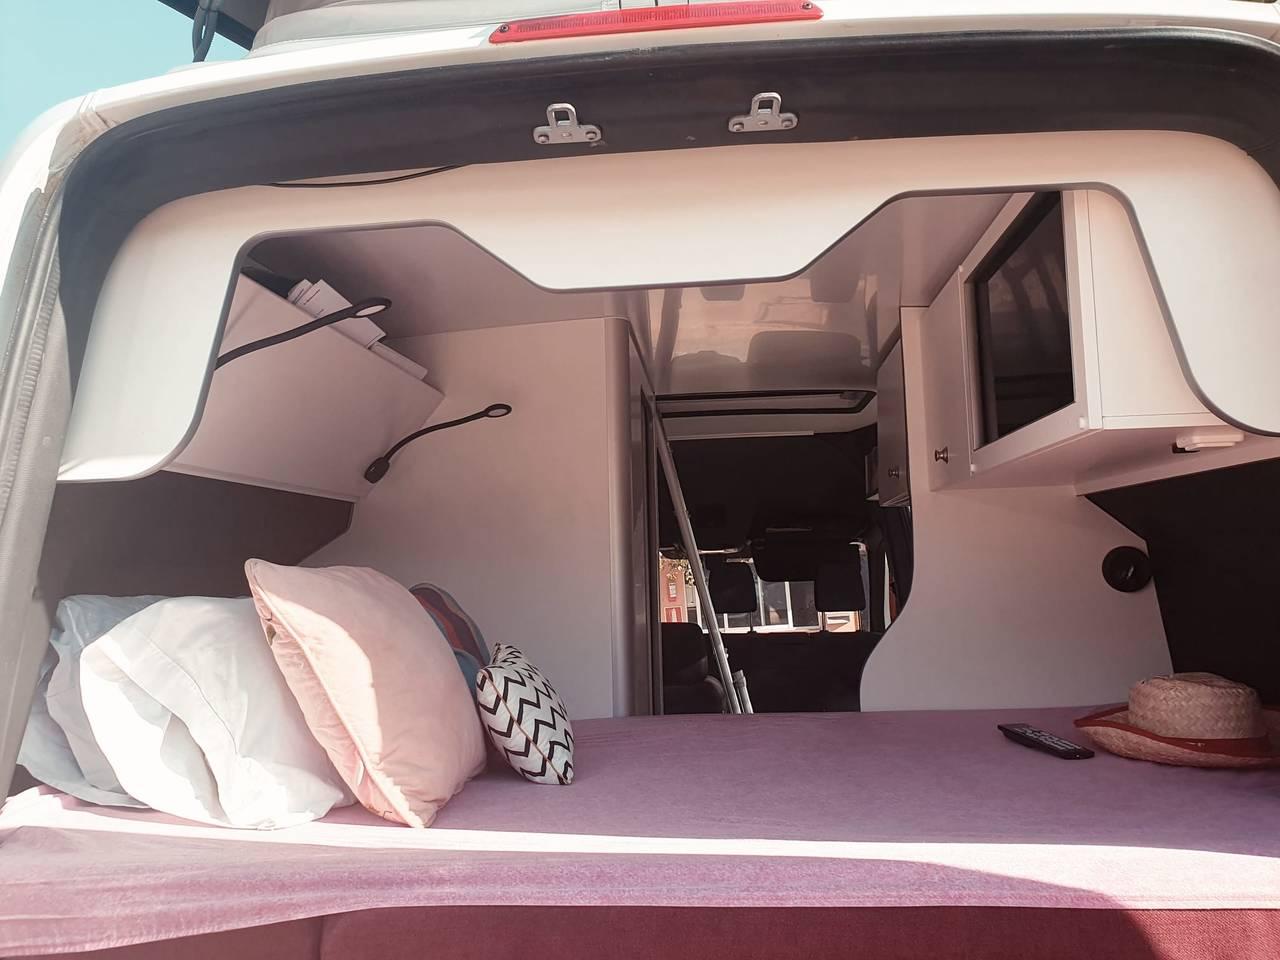 Alquiler furgoneta Camper en Alicante Mercedes  - Foto 4